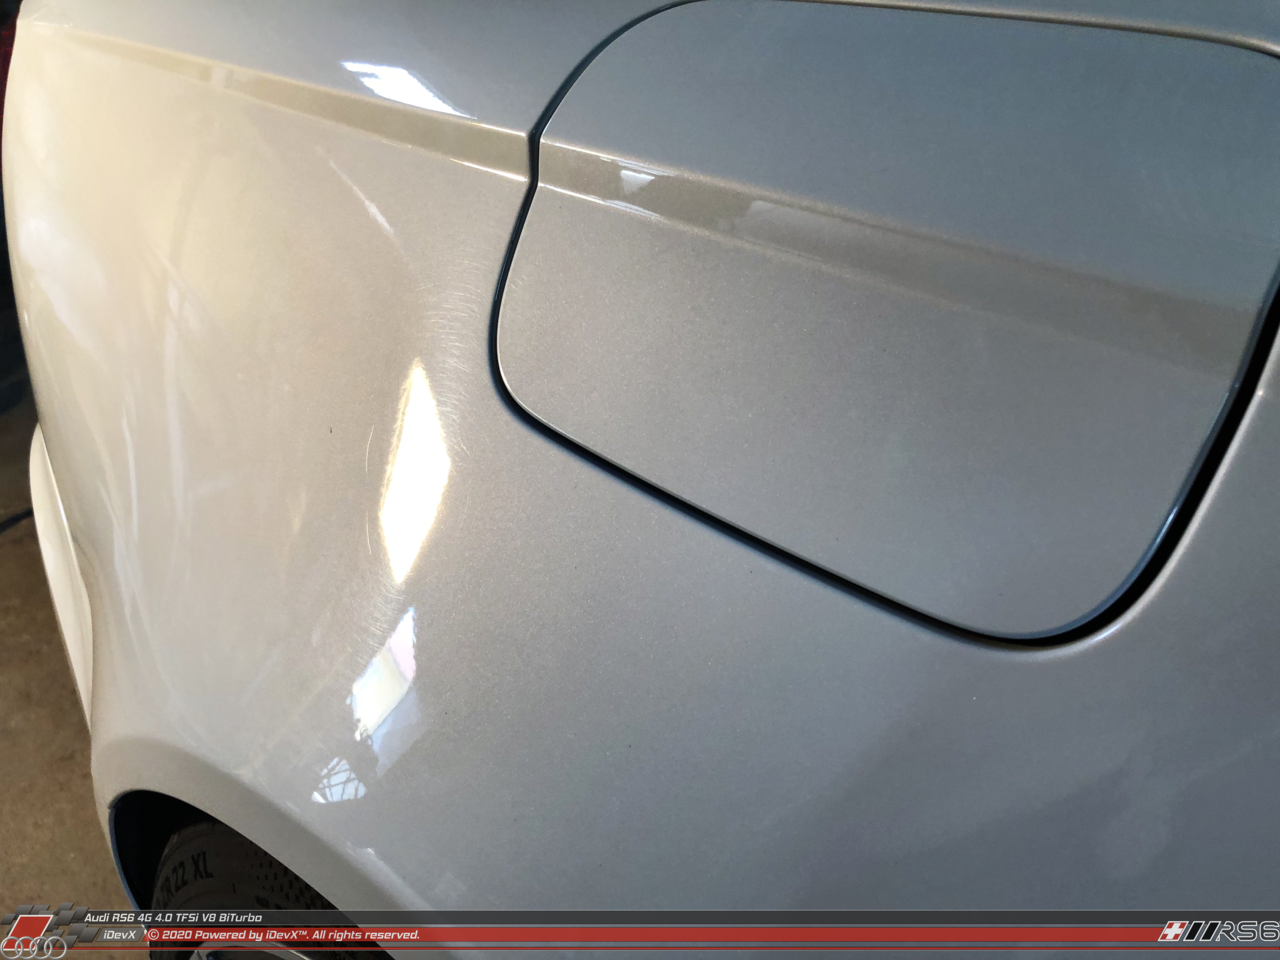 05_08.2019_Audi-RS6_iDevX_010.png